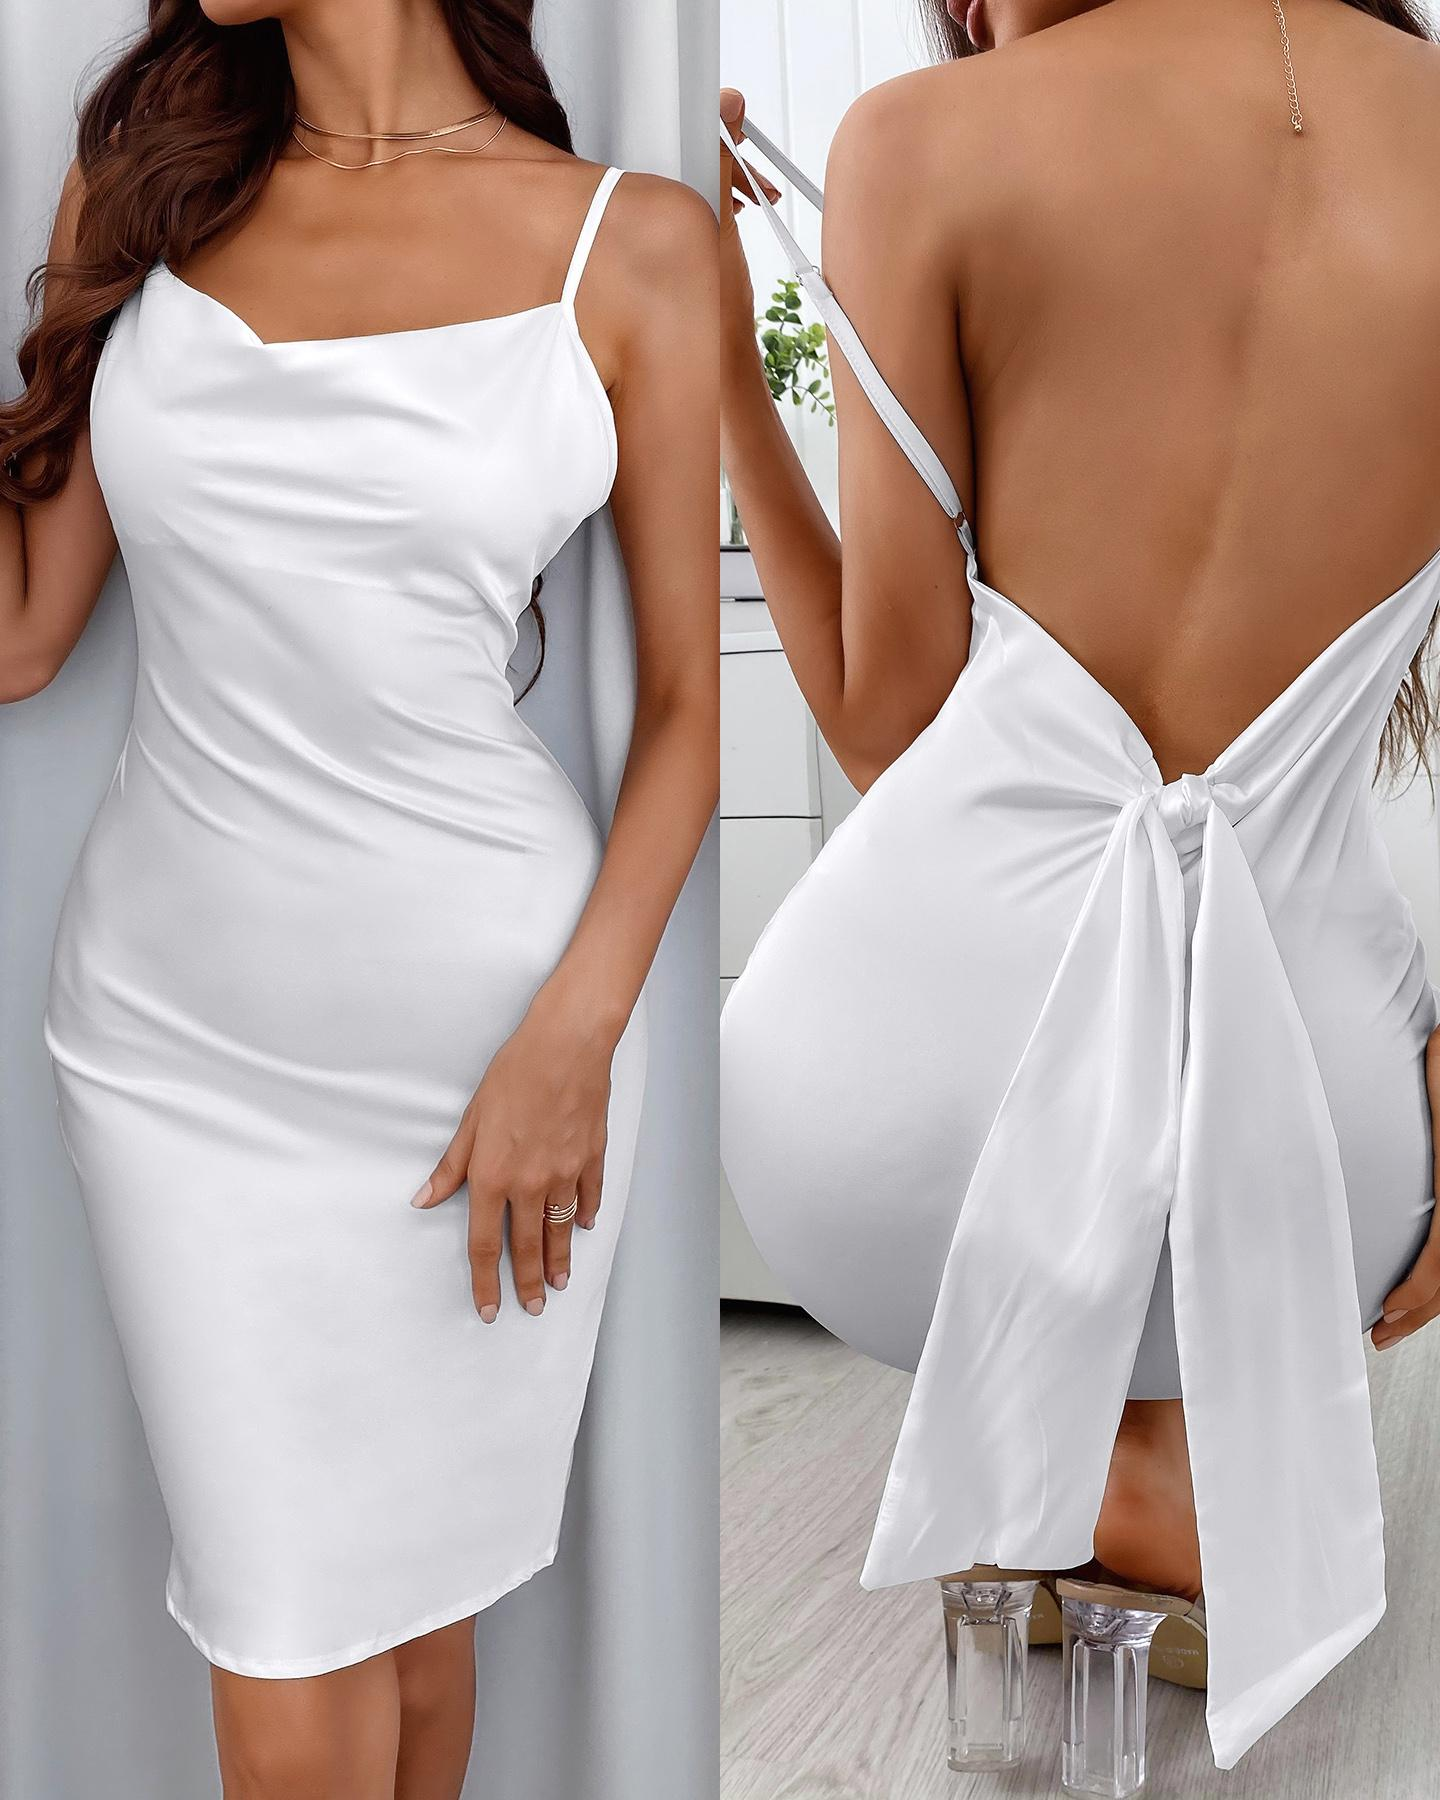 Spaghetti Strap Cowl Neck Backless Knotted Design Midi Dress